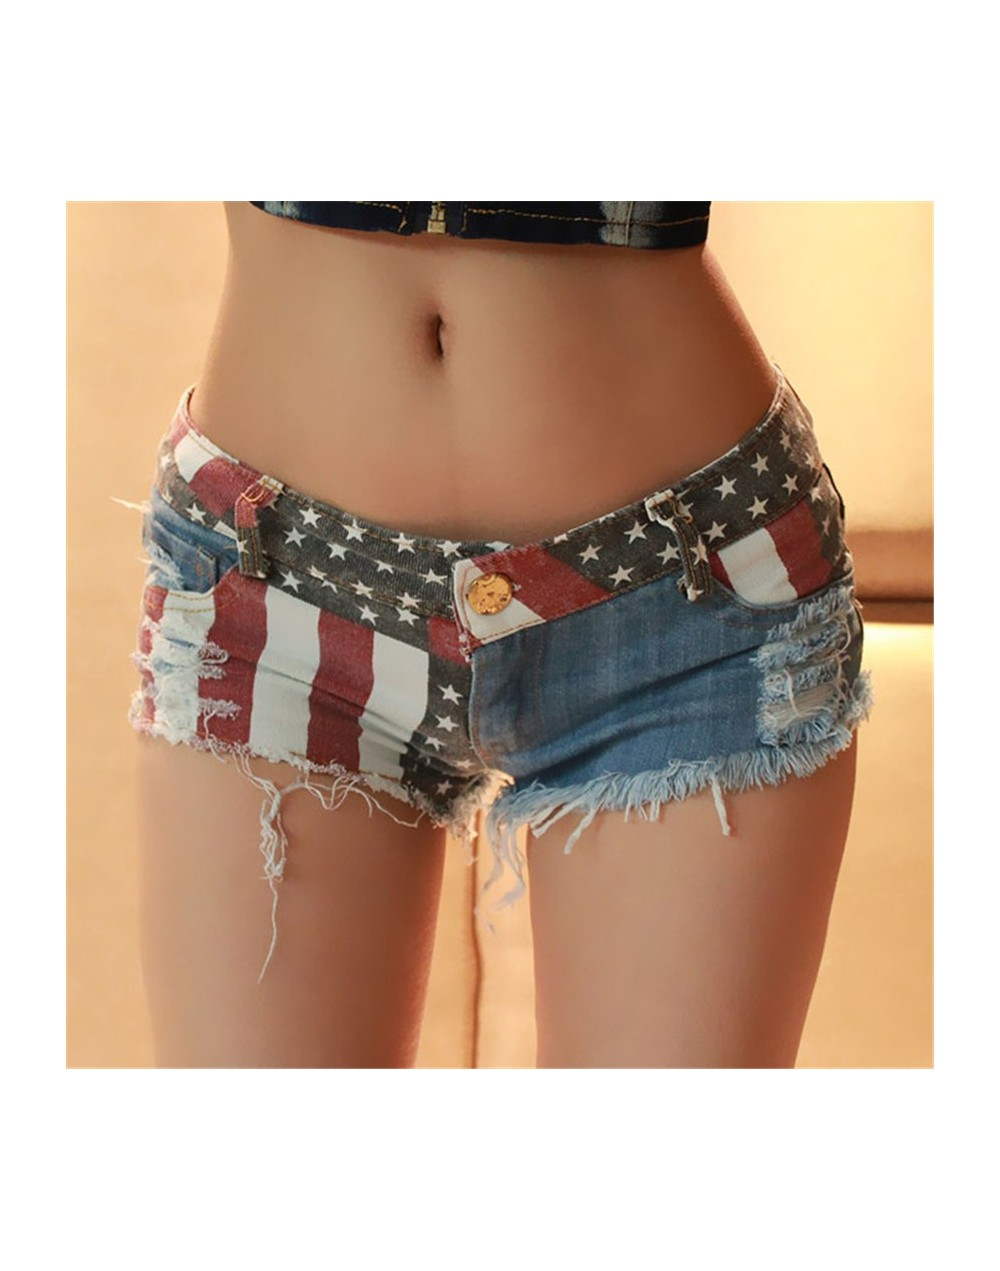 Shocking Show 1PC Sexy American Flag Mini Shorts Jeans Hot Denim Low Waist A487 - 4G3949355539